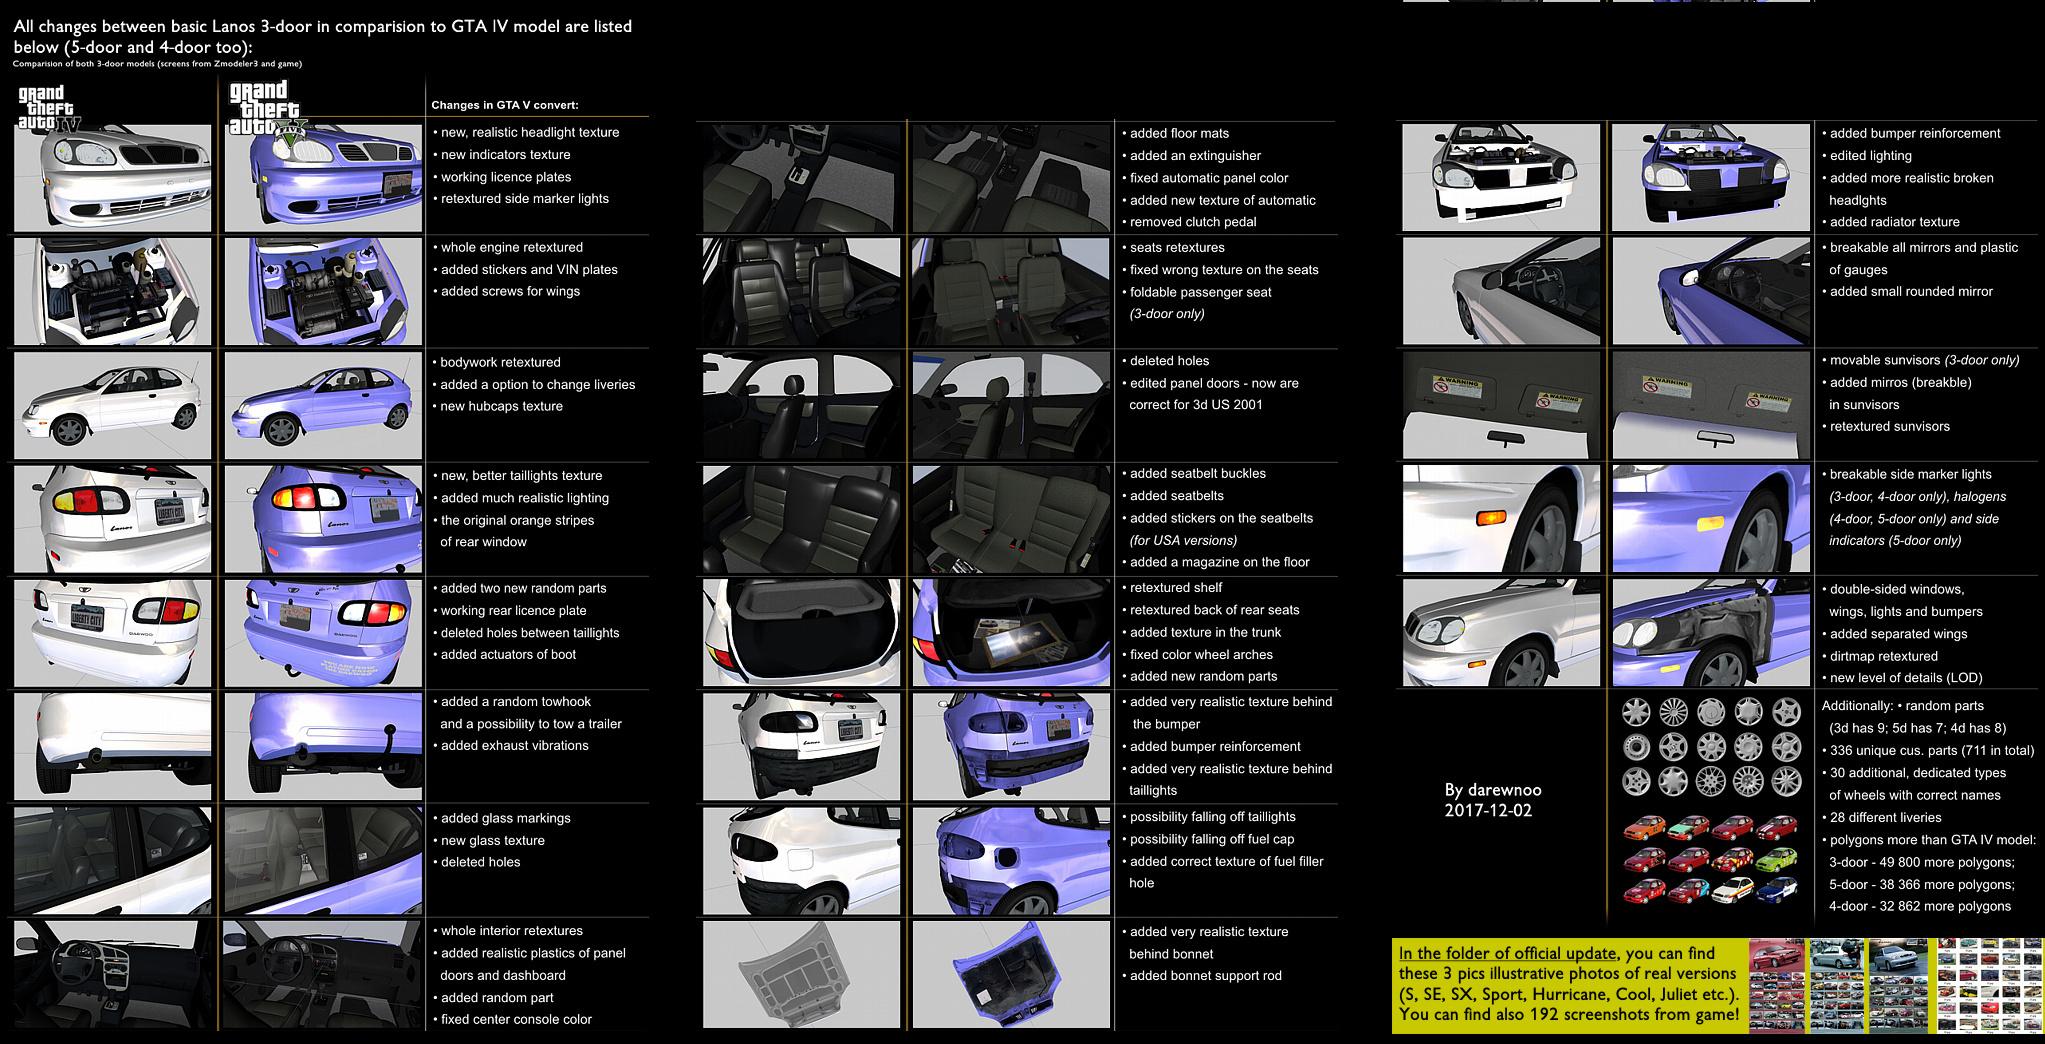 Pilot 2002 moreover Watch also 2000 Daewoo Lanos Add On Tuning Rims Animated Official Convert likewise 2002 Daewoo Lanos moreover 2011 Mini Clubman Service Manual Pdf. on 2001 daewoo nubira wagon